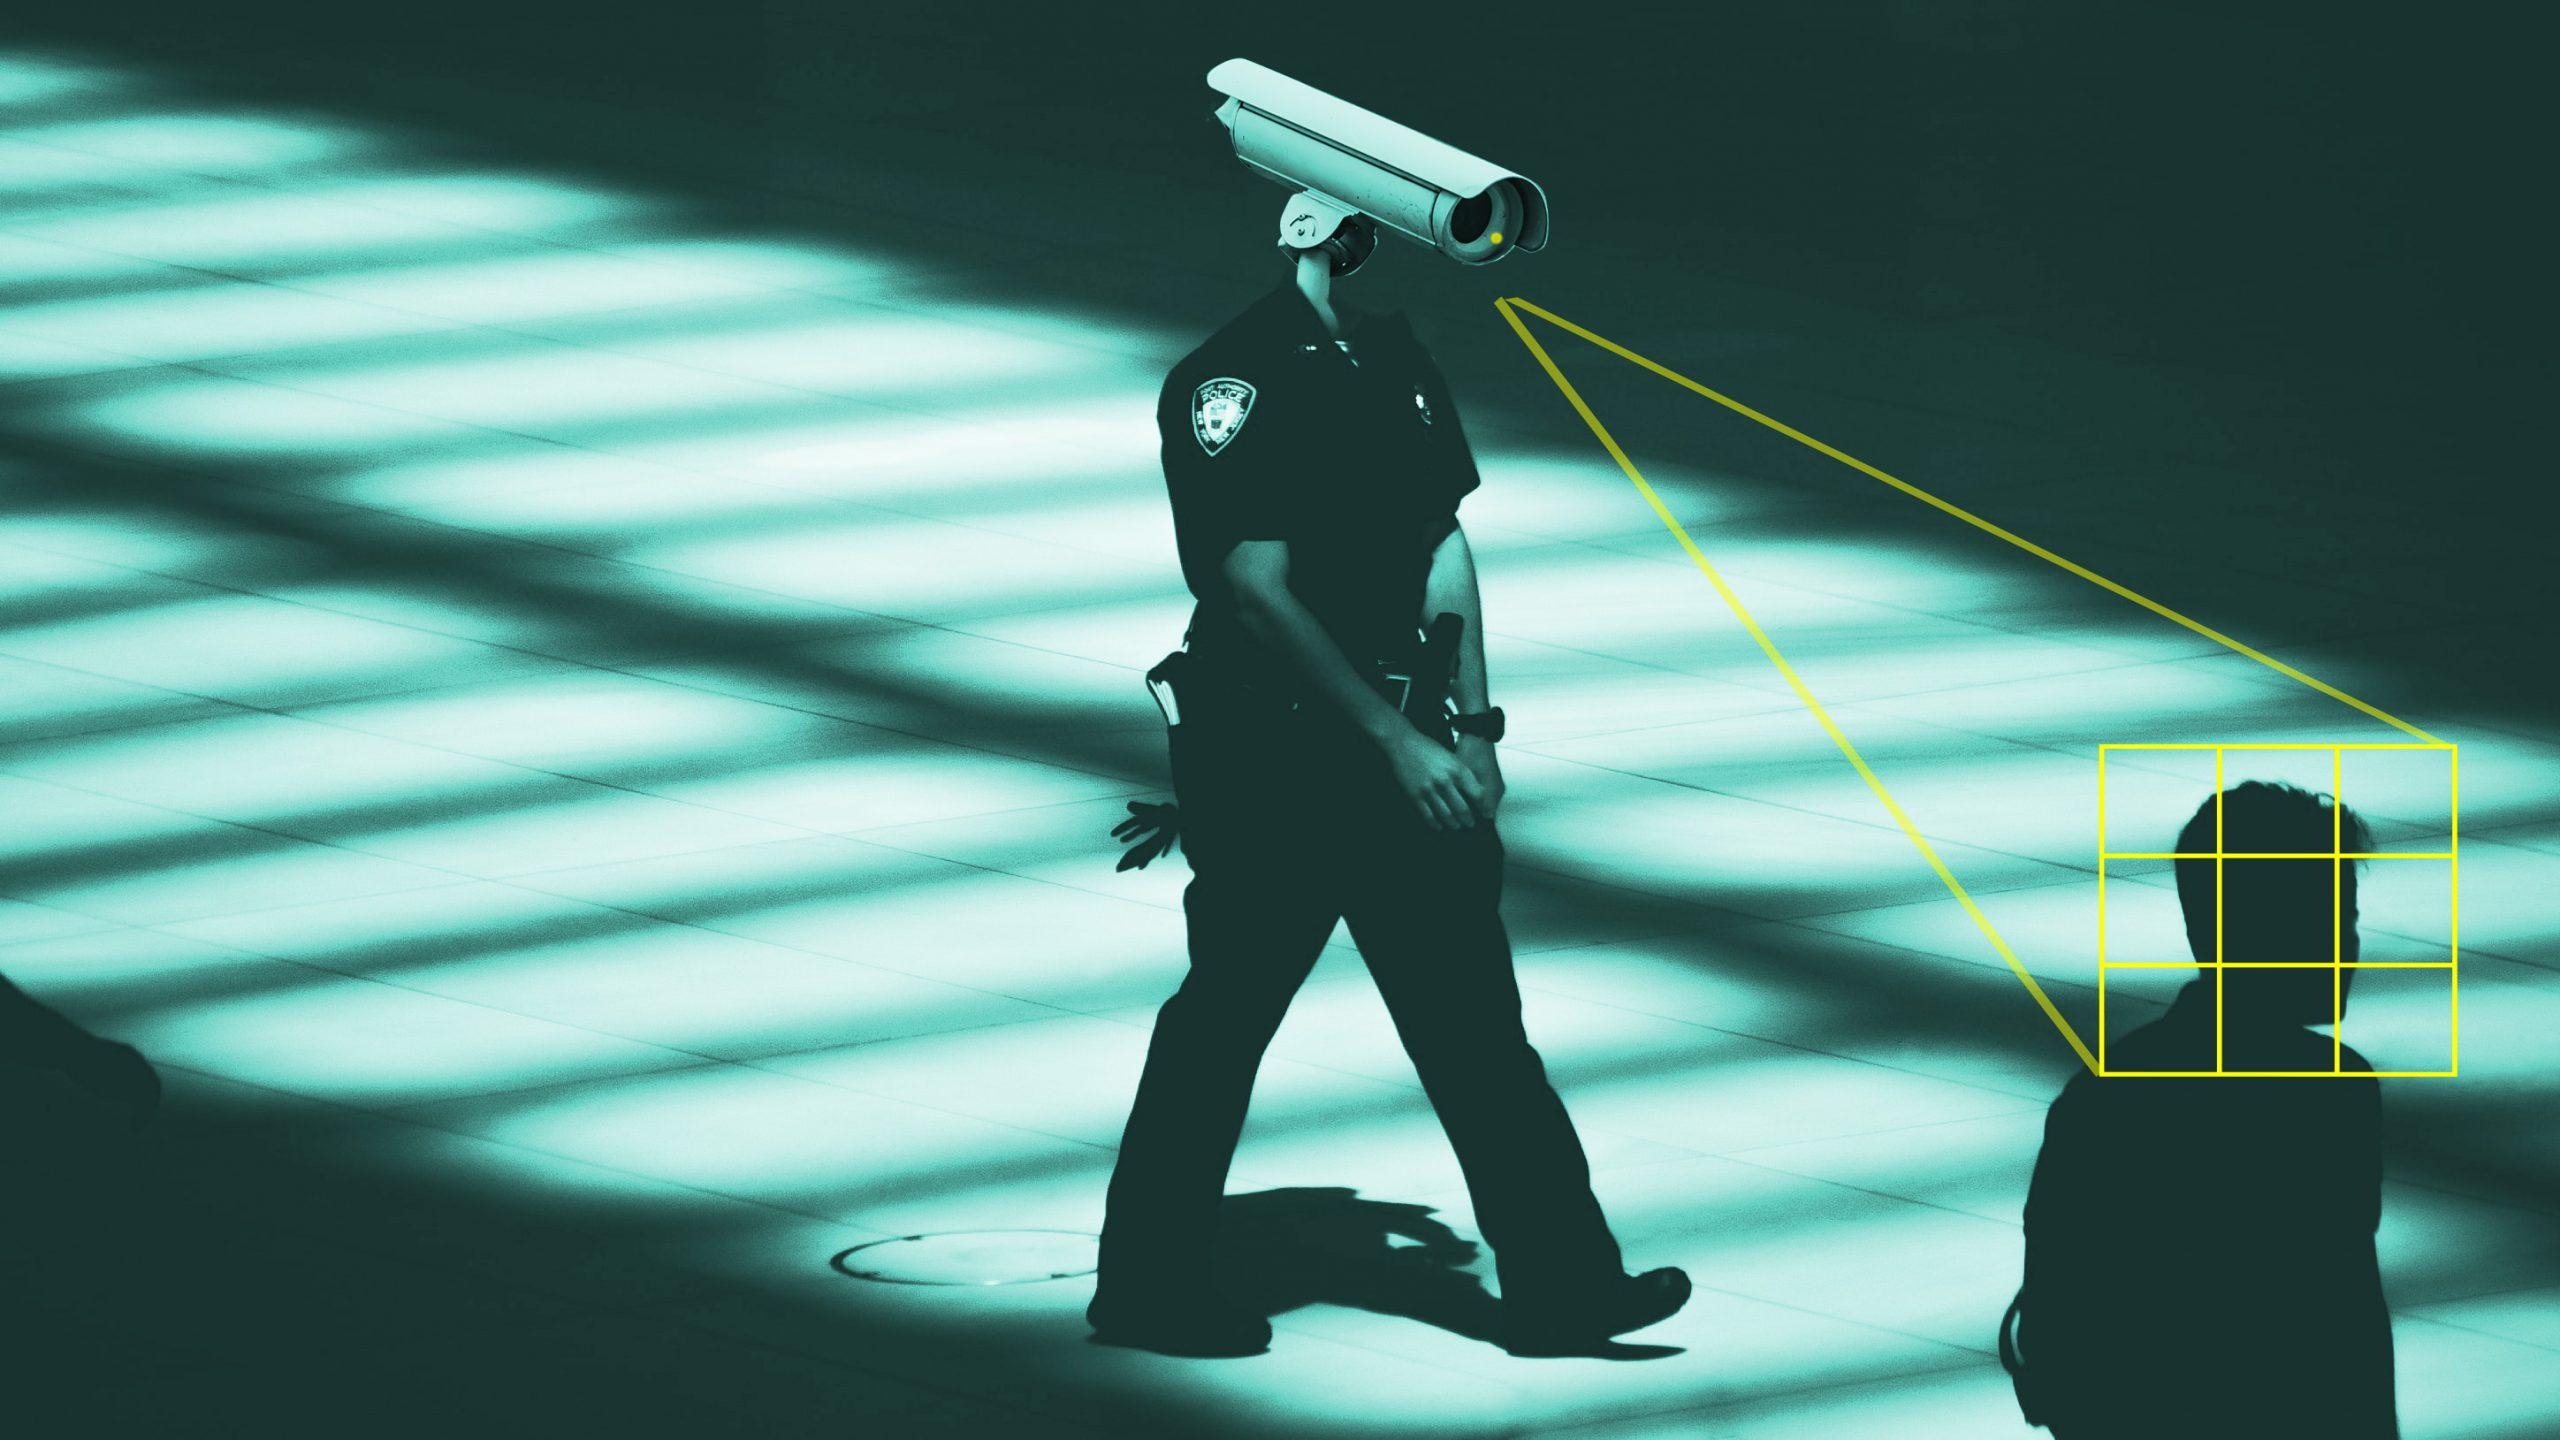 MIT Tech Review: 顔認識技術、静かに浸透 大手テック撤退でも米警察は積極導入